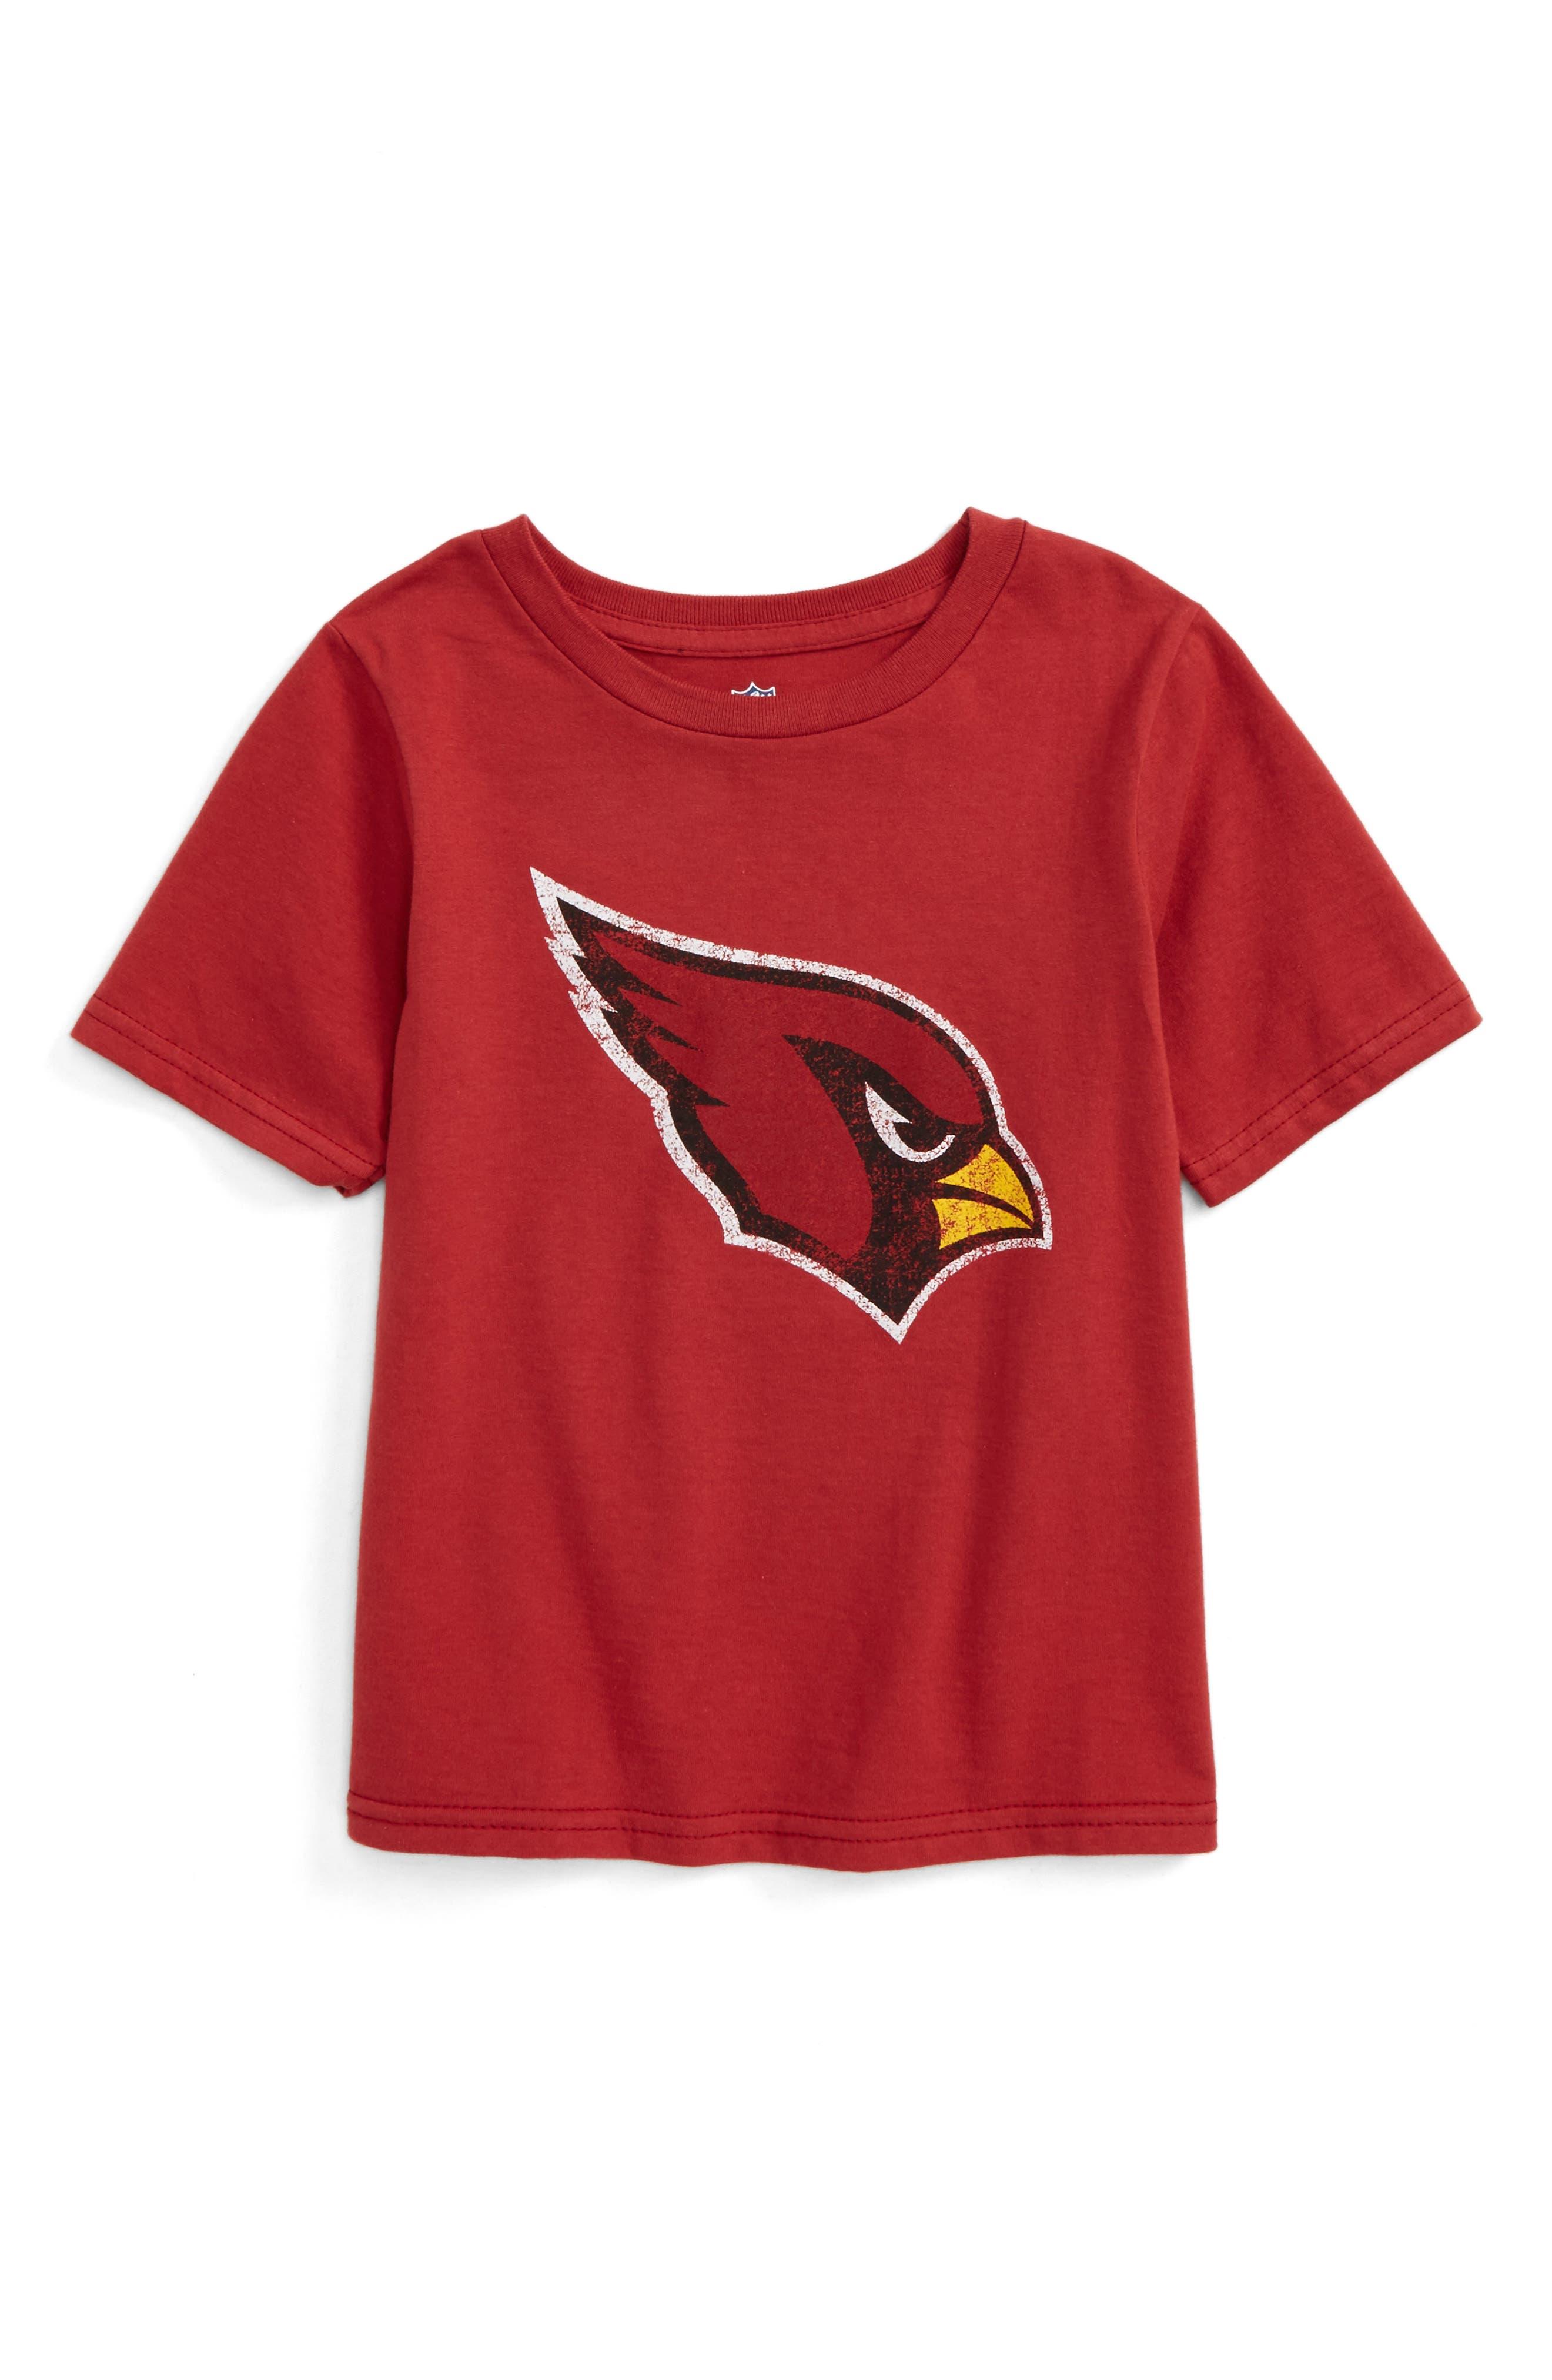 Outerstuff NFL - Arizona Cardinals Distressed Logo T-Shirt (Toddler Boys & Little Boys)